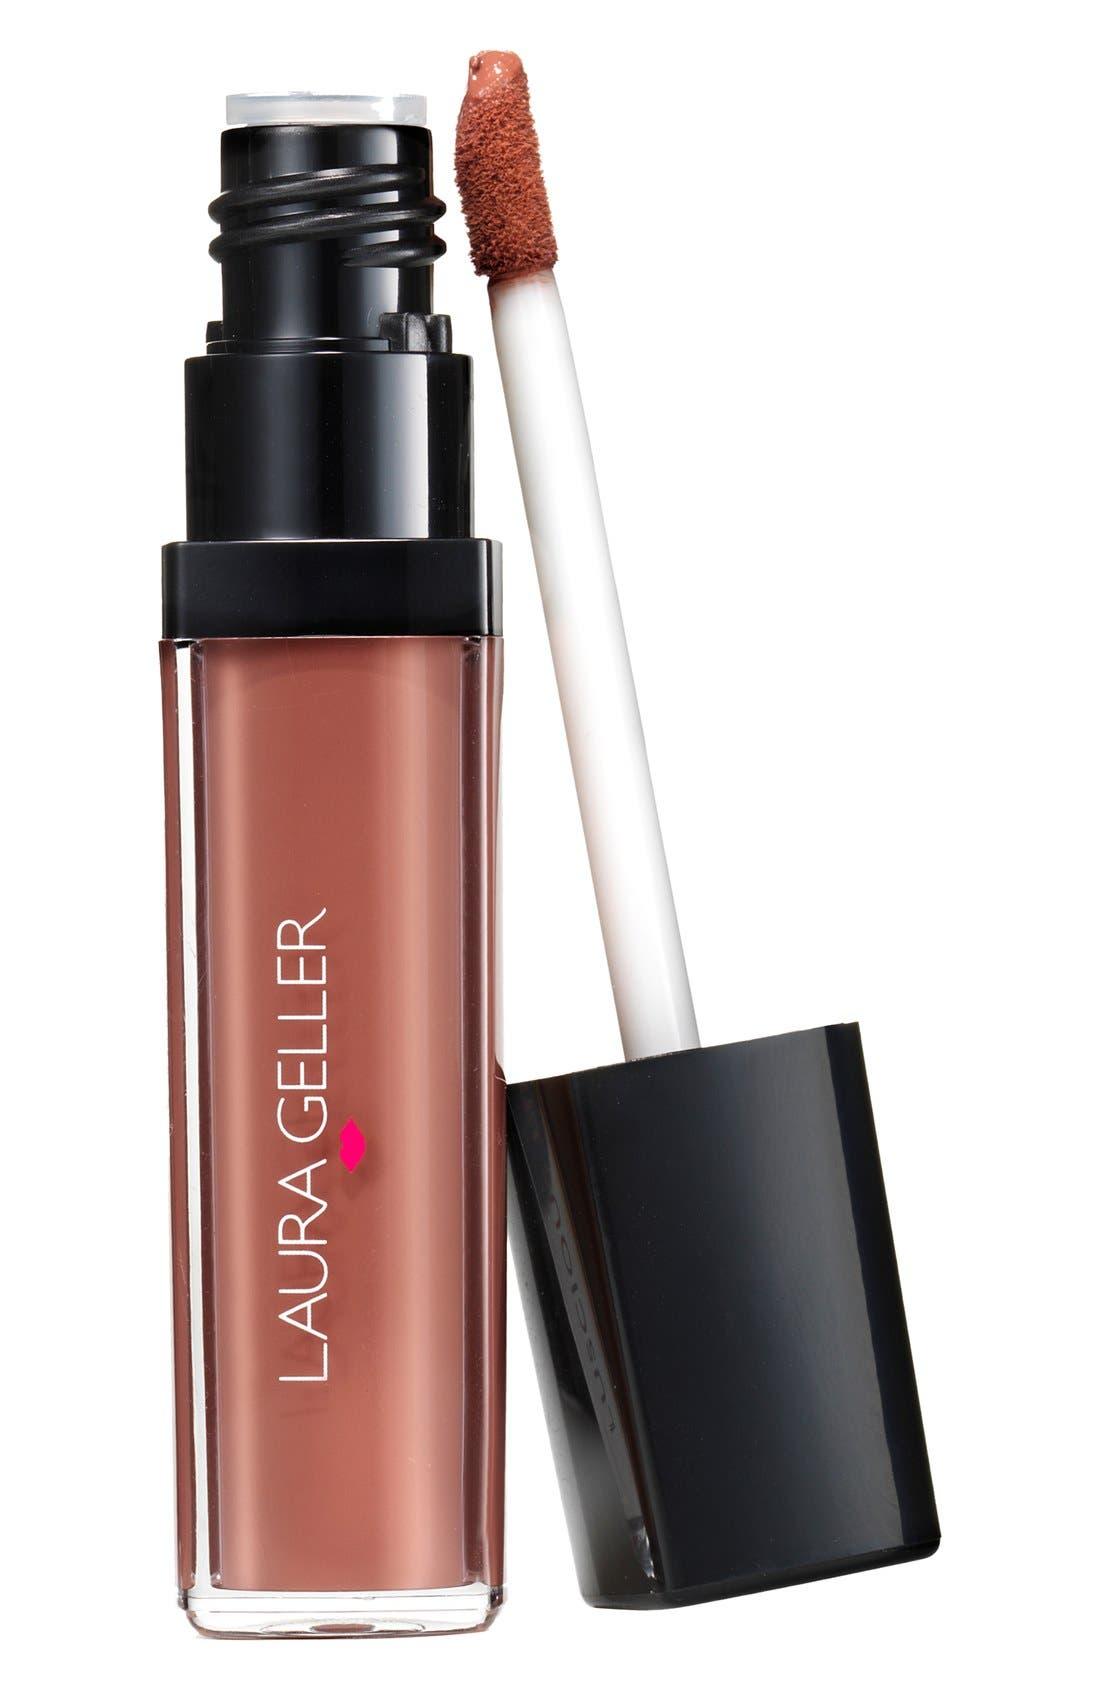 Laura Geller Beauty 'Luscious Lips' Liquid Lipstick